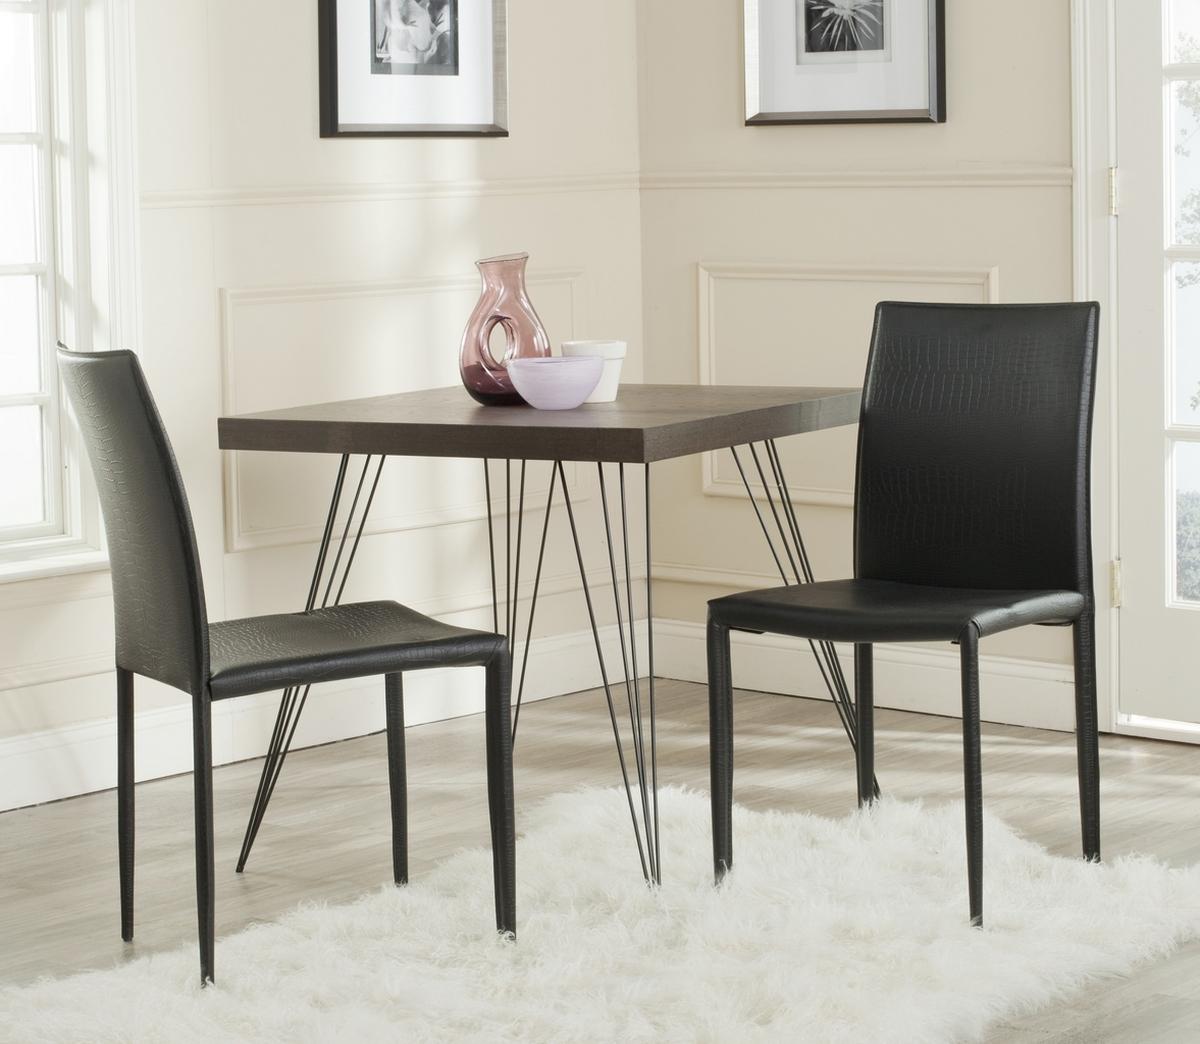 safavieh karna dining chair poly wood chairs fox2009n set2 furniture by